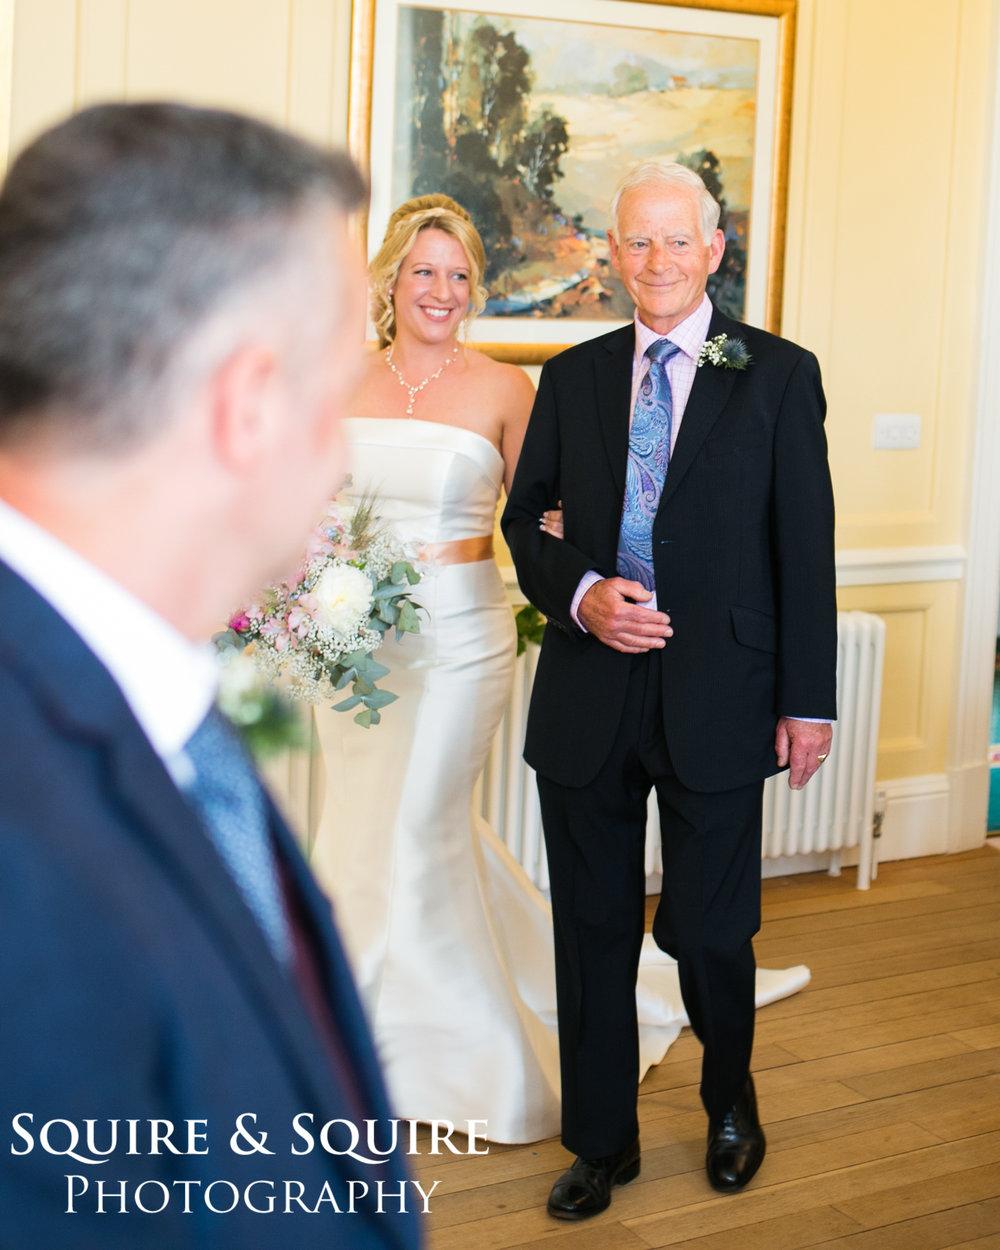 wedding_photography_catthorpe Manor (26 of 66).jpg